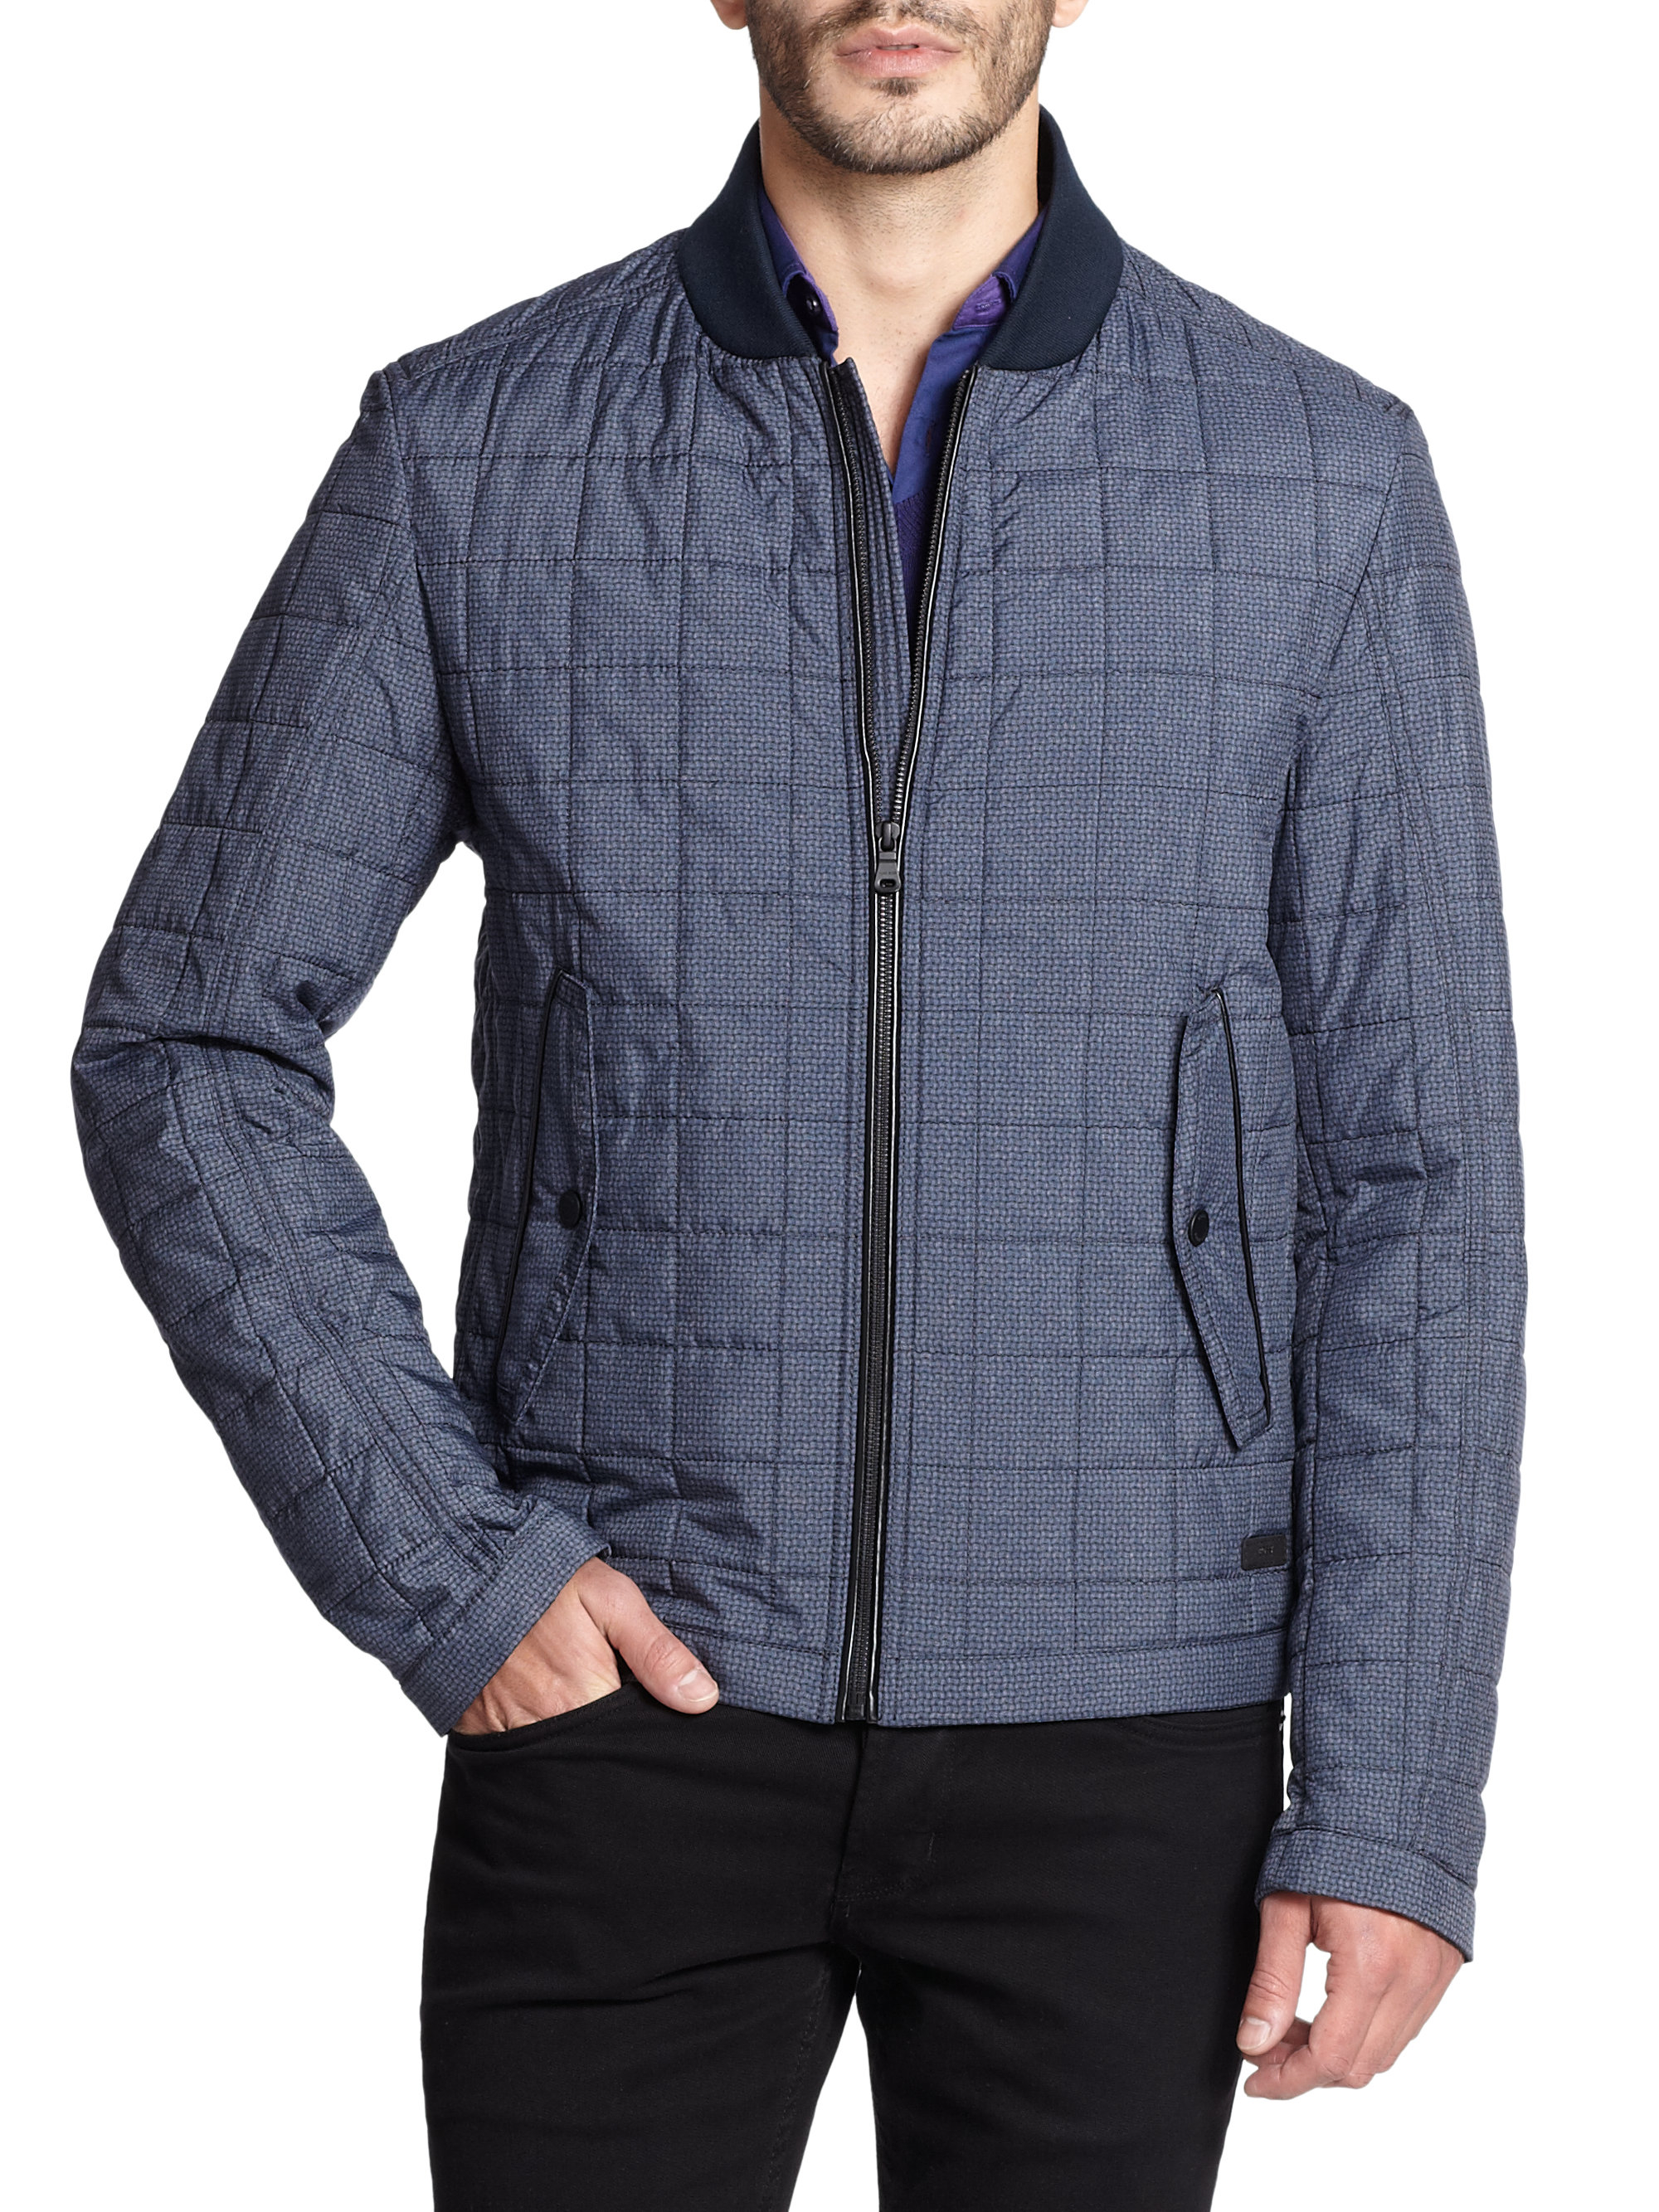 hugo boss cornias printed nylon jacket in blue for men. Black Bedroom Furniture Sets. Home Design Ideas